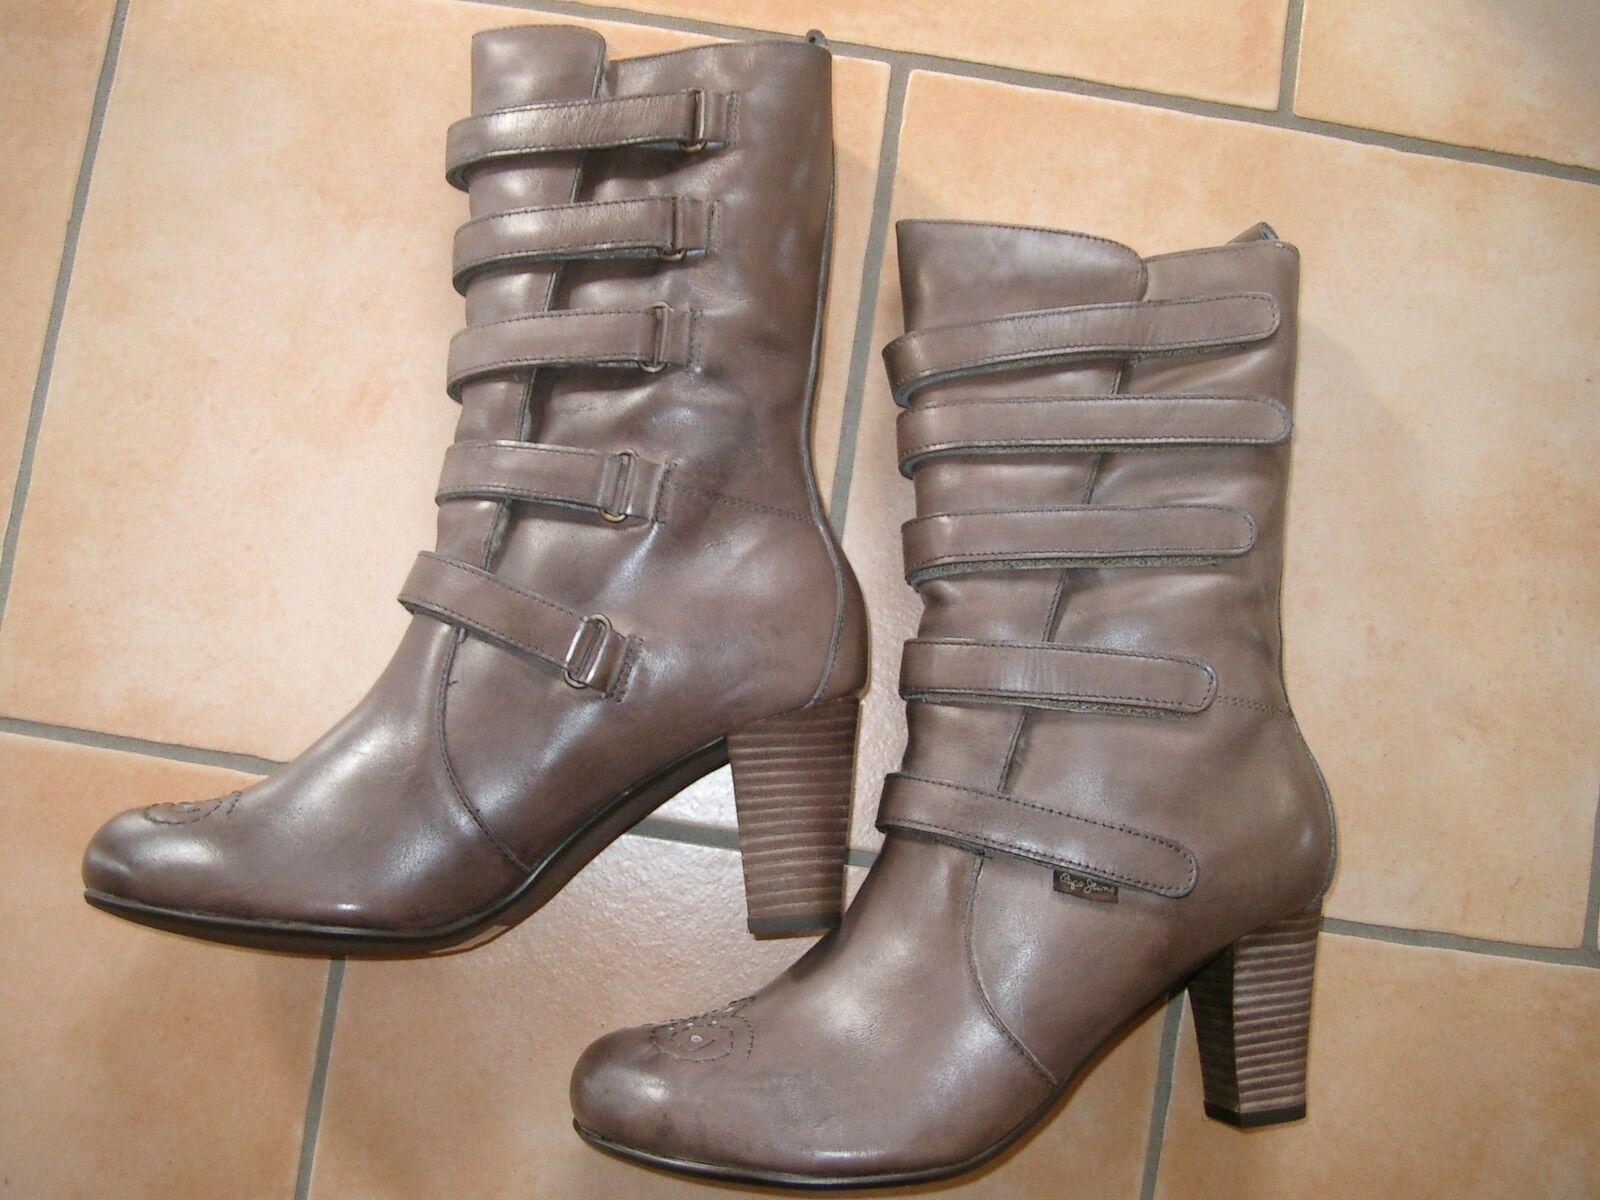 (Z26) (Z26) (Z26) Hohe Pepe Jeans Damen Schuhe Leder Stiefel gefüttert Klettverschluß gr.37 b5c63a